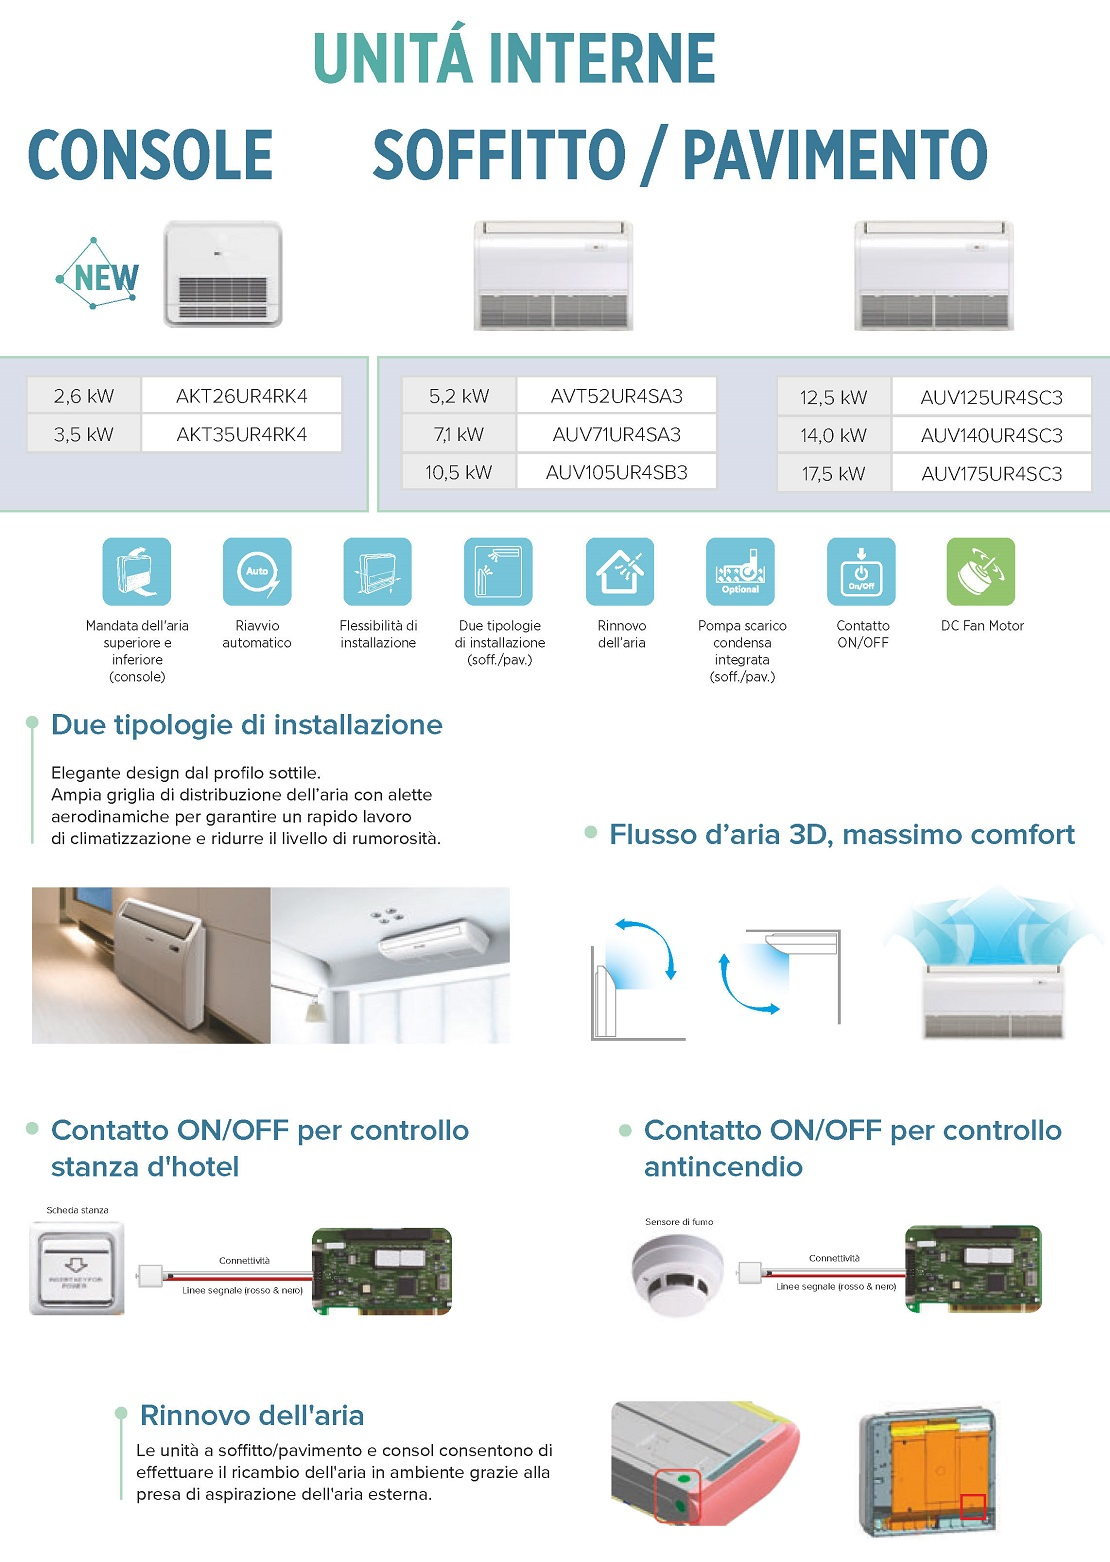 Condizionatore Hisense Commerciale 24000 Btu AUV71UR4 A++/A+